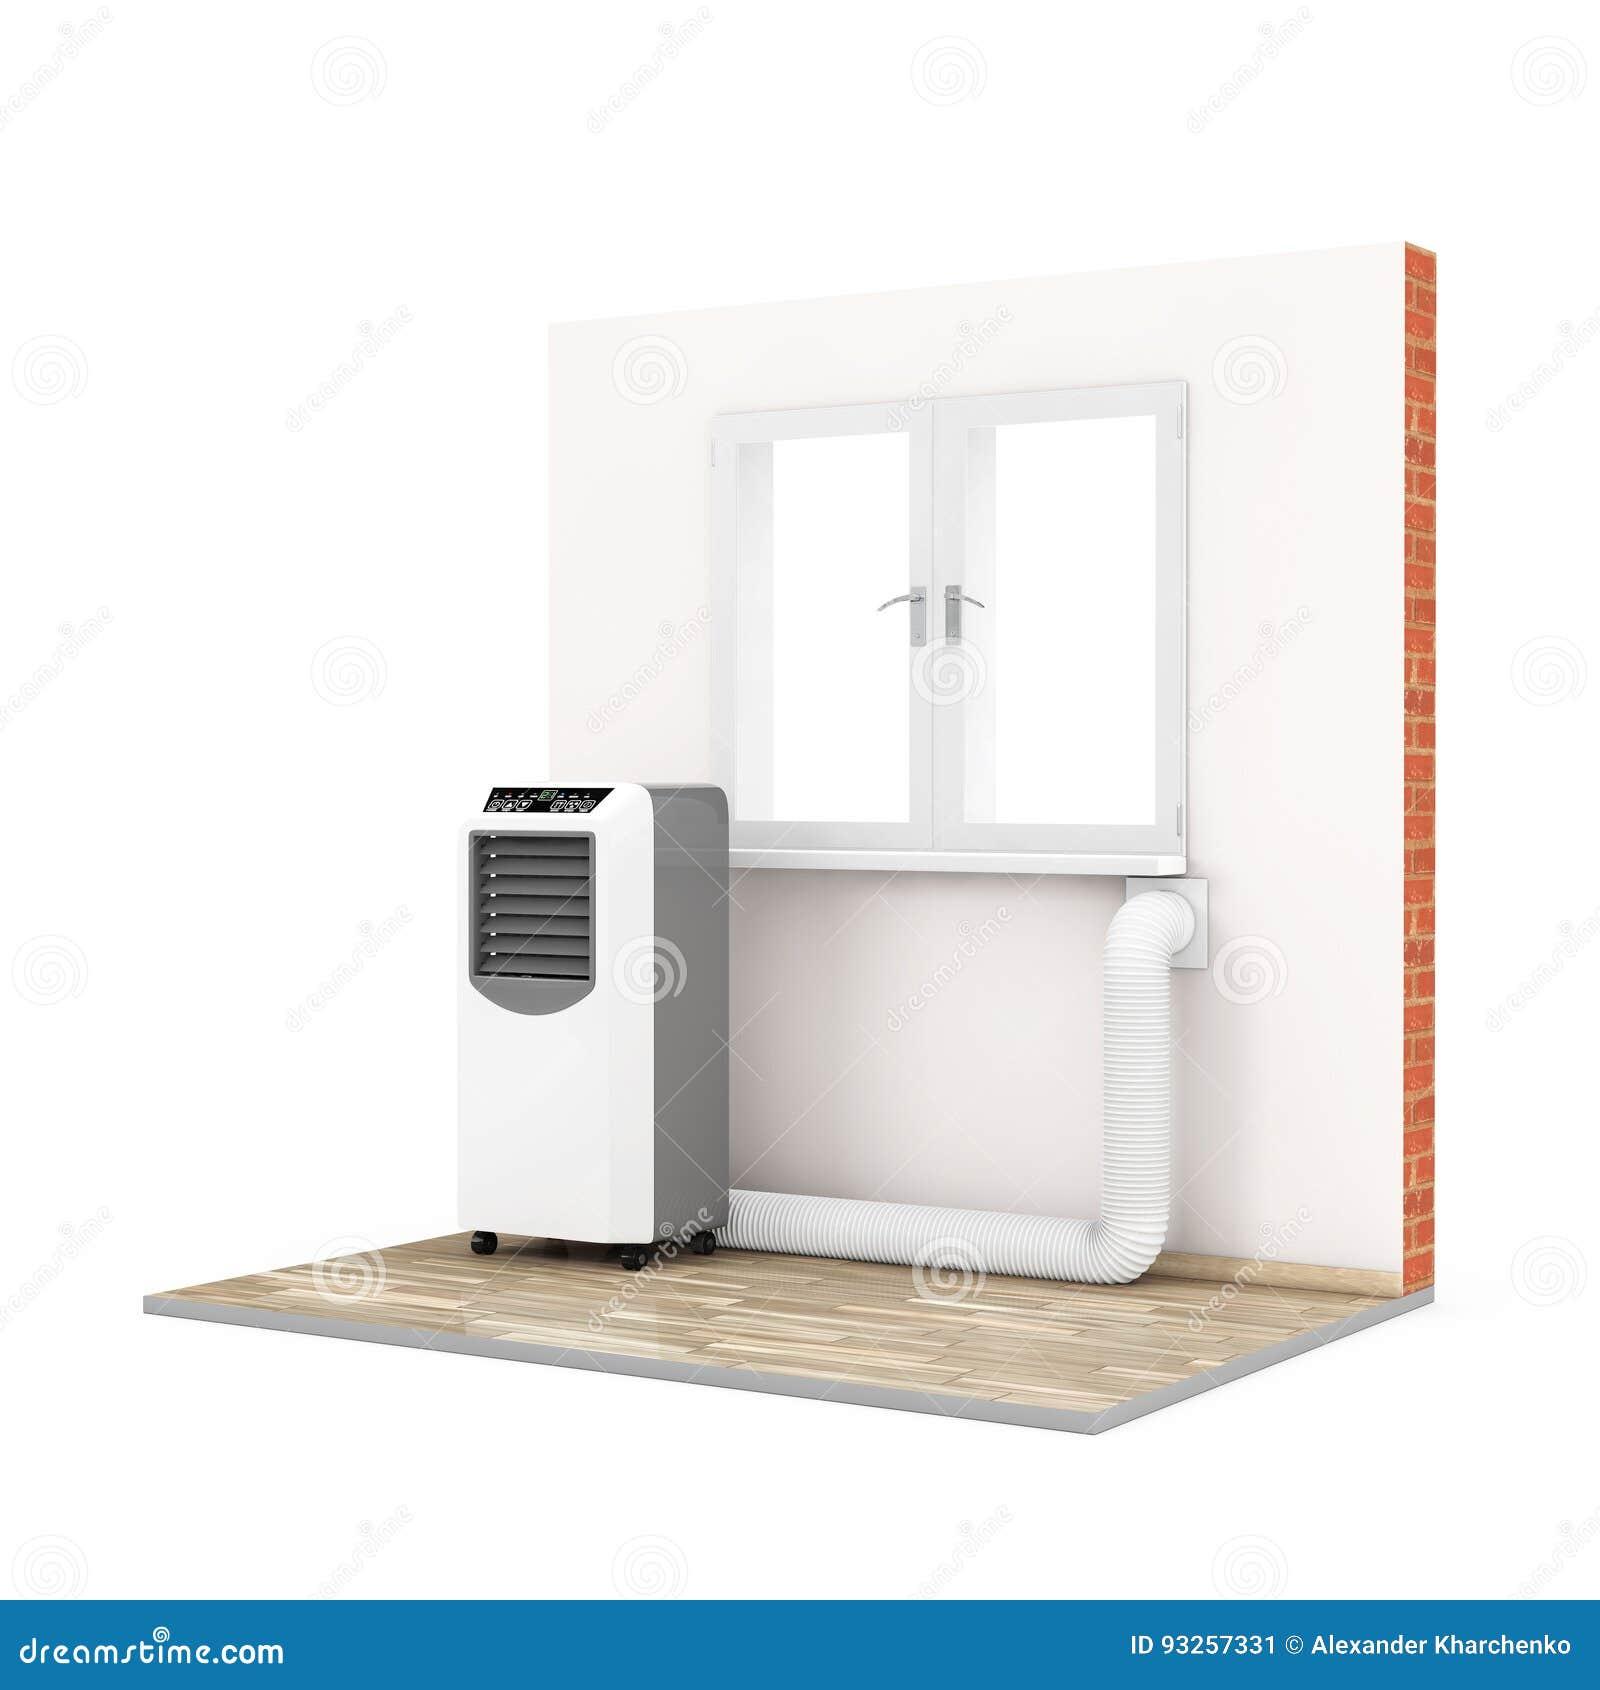 Room Air Conditioner Vent Hose